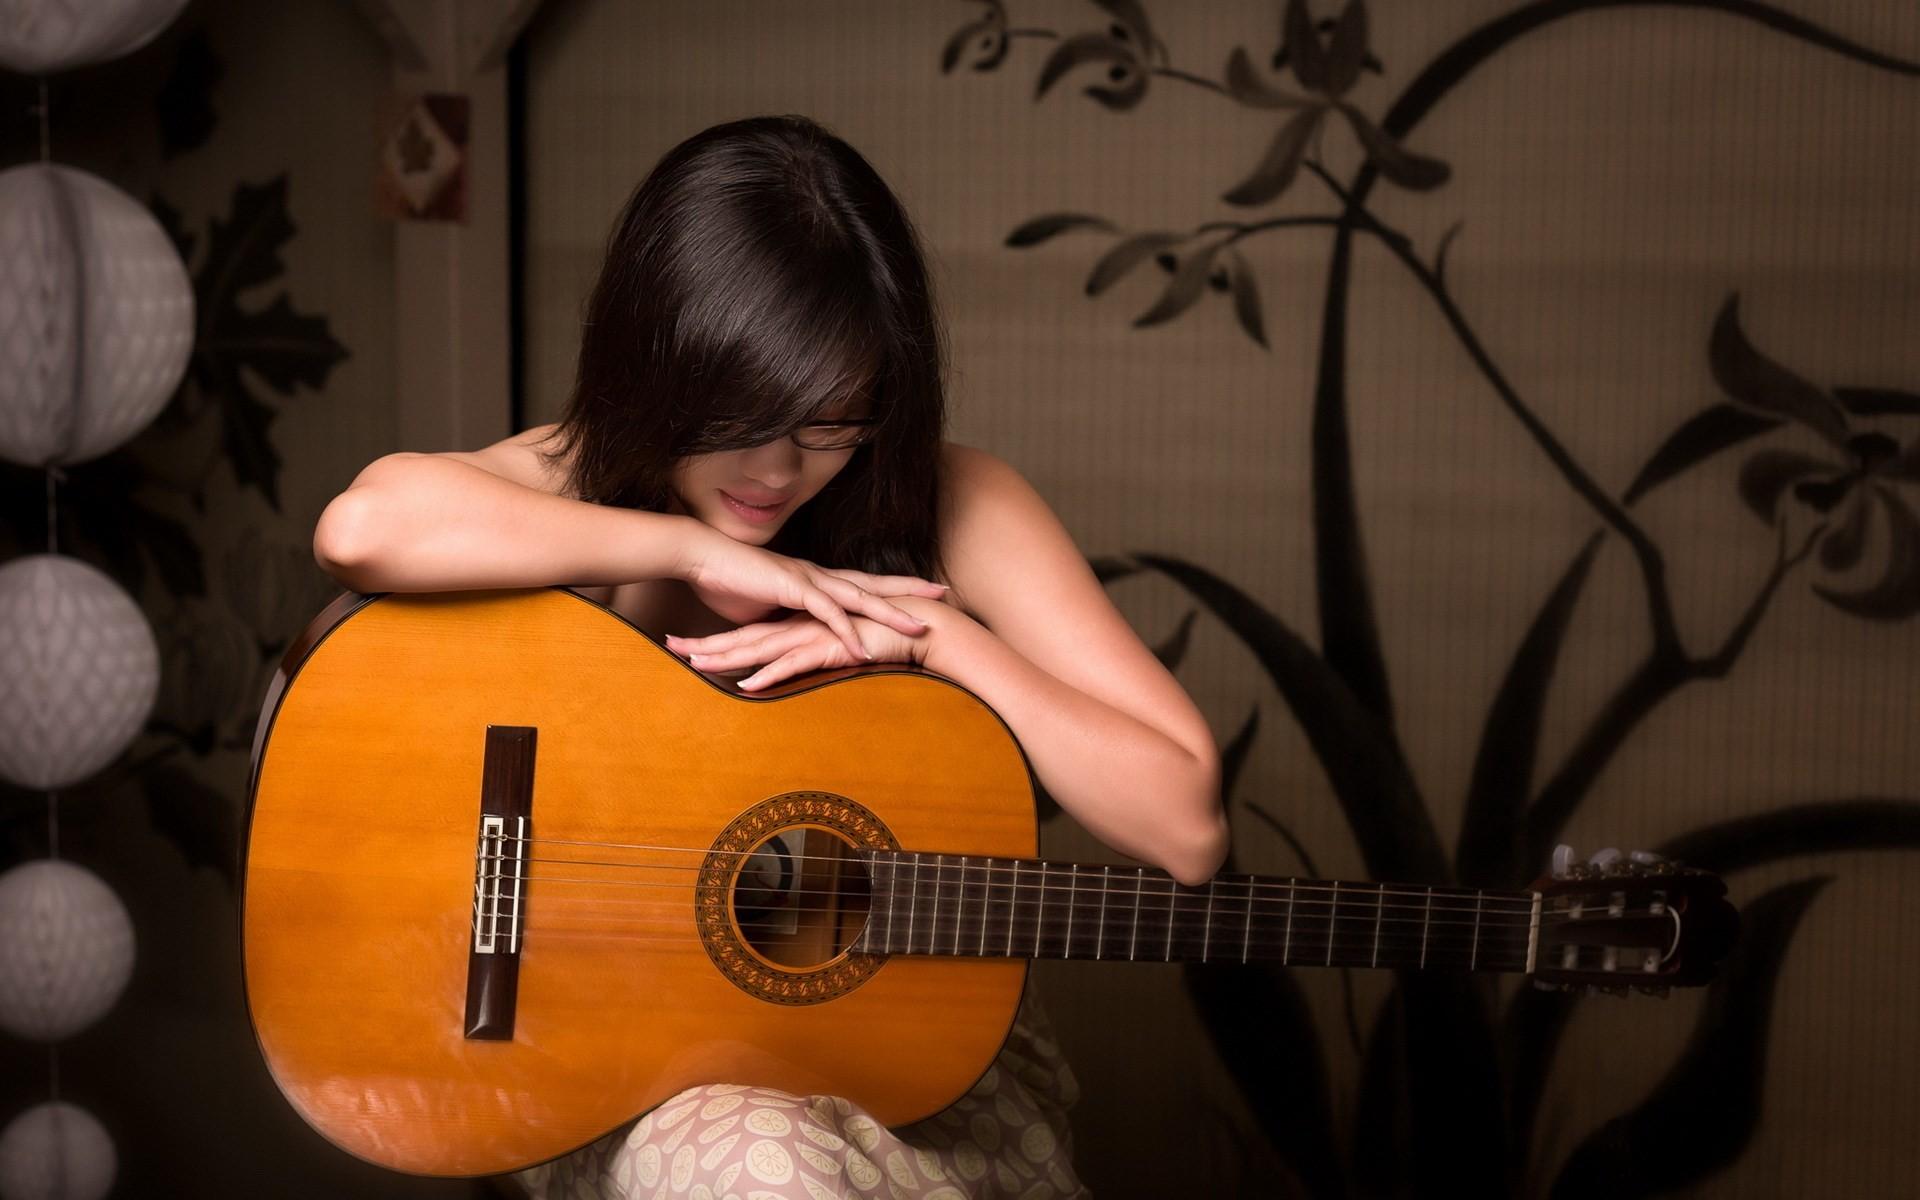 2560x1600 Guitar Girl Beach Alone HD